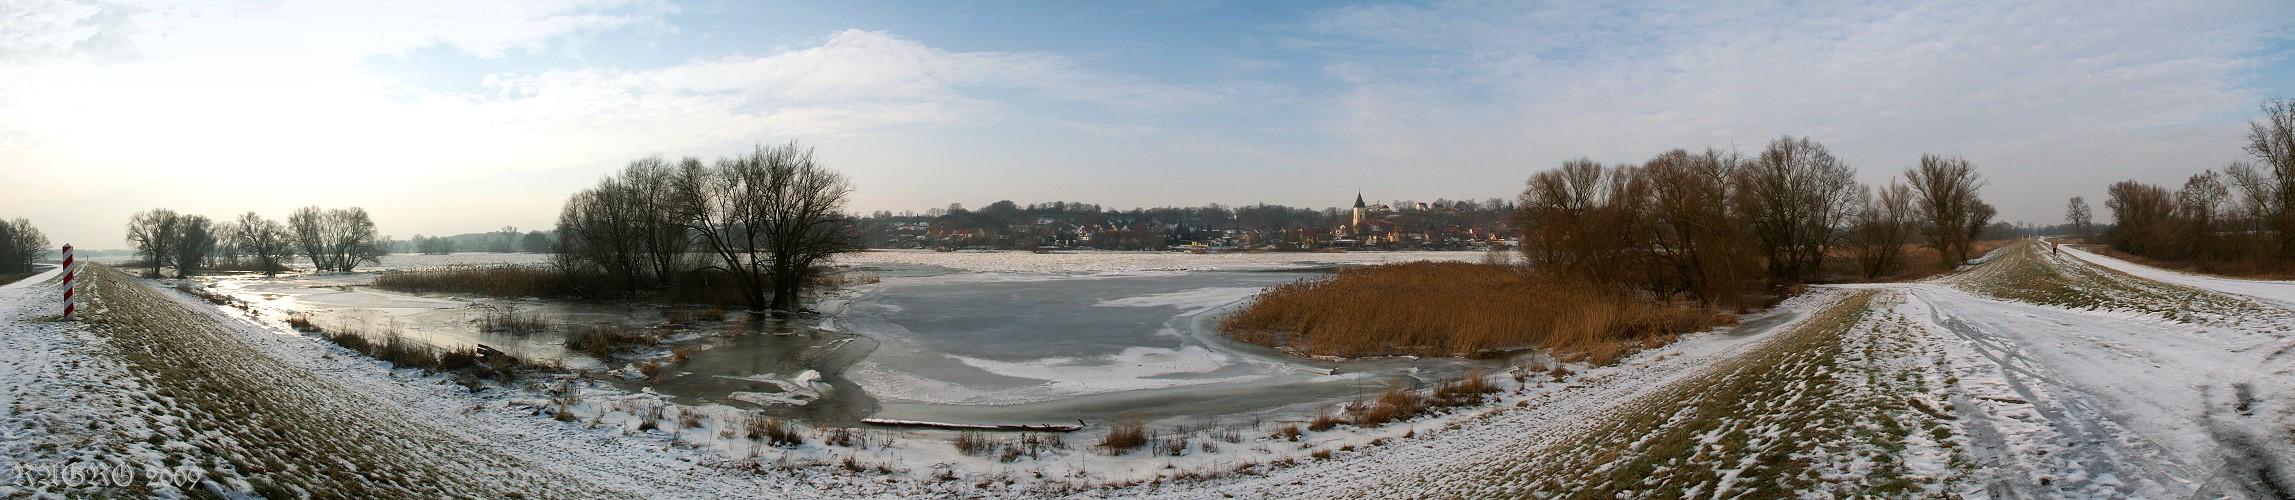 Winter im Lebuser Land